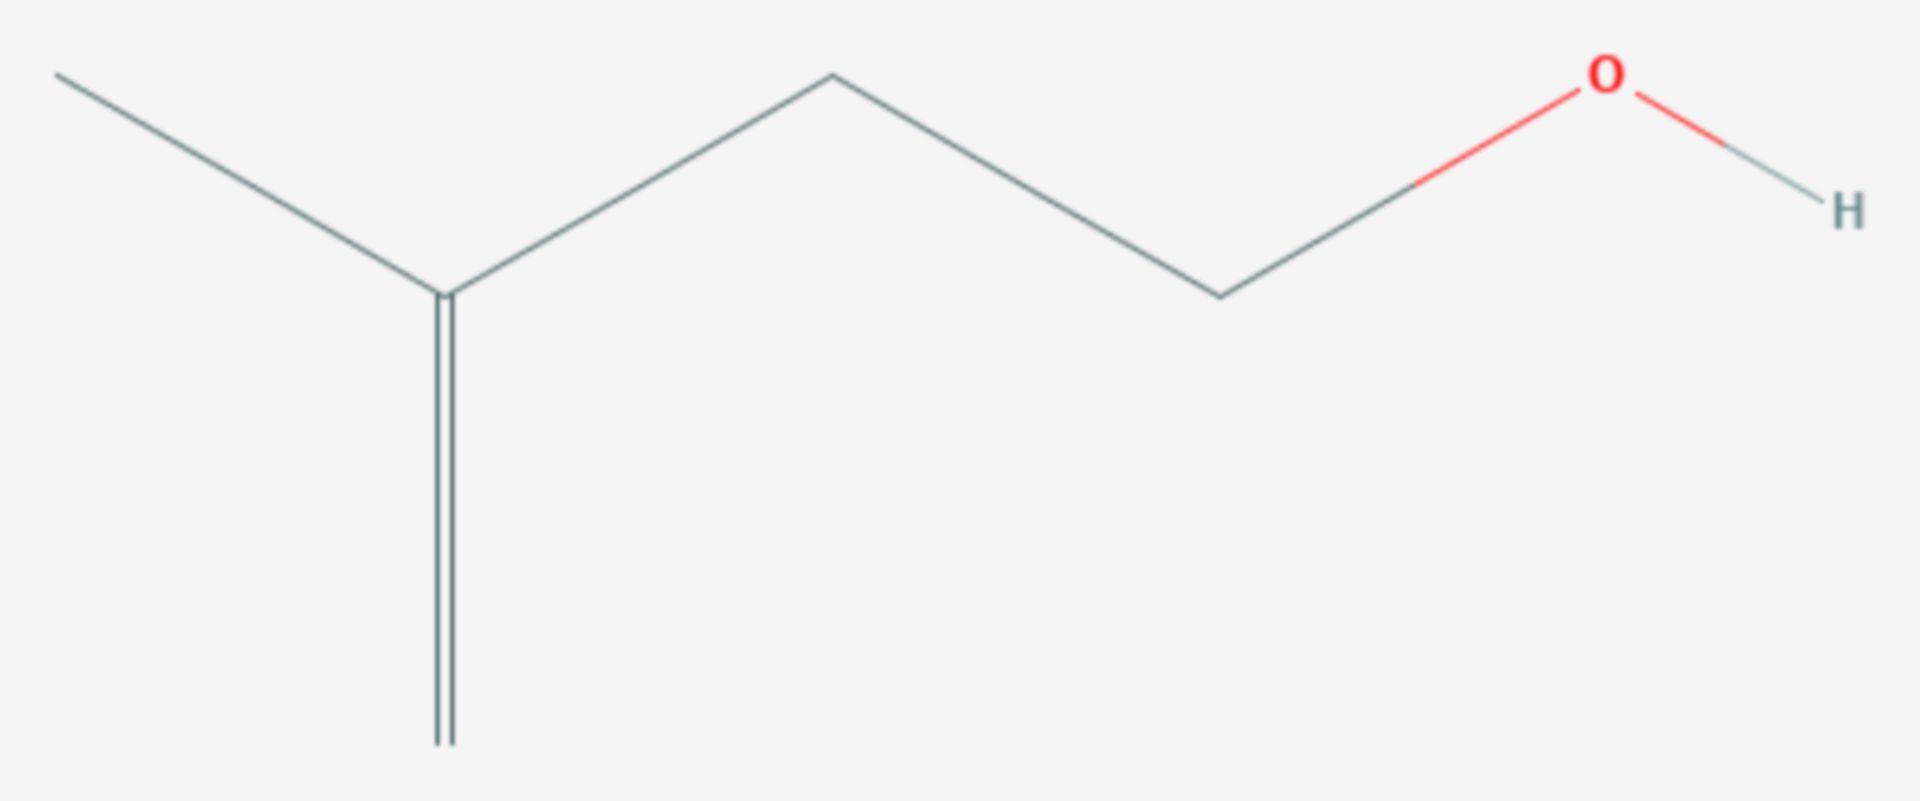 Isoprenol (Strukturformel)